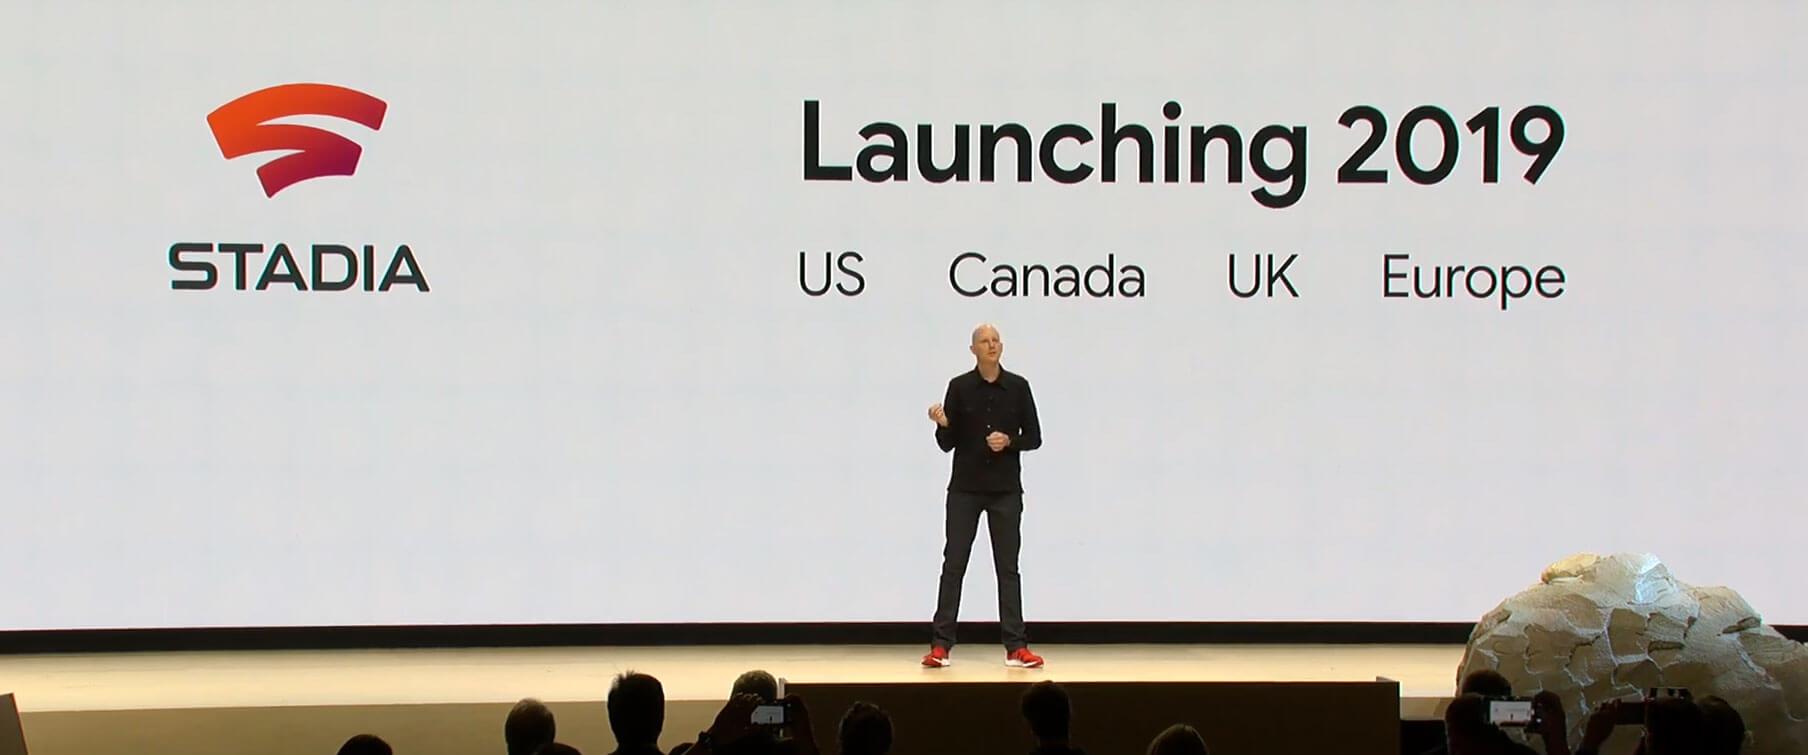 stadia_launch.jpg